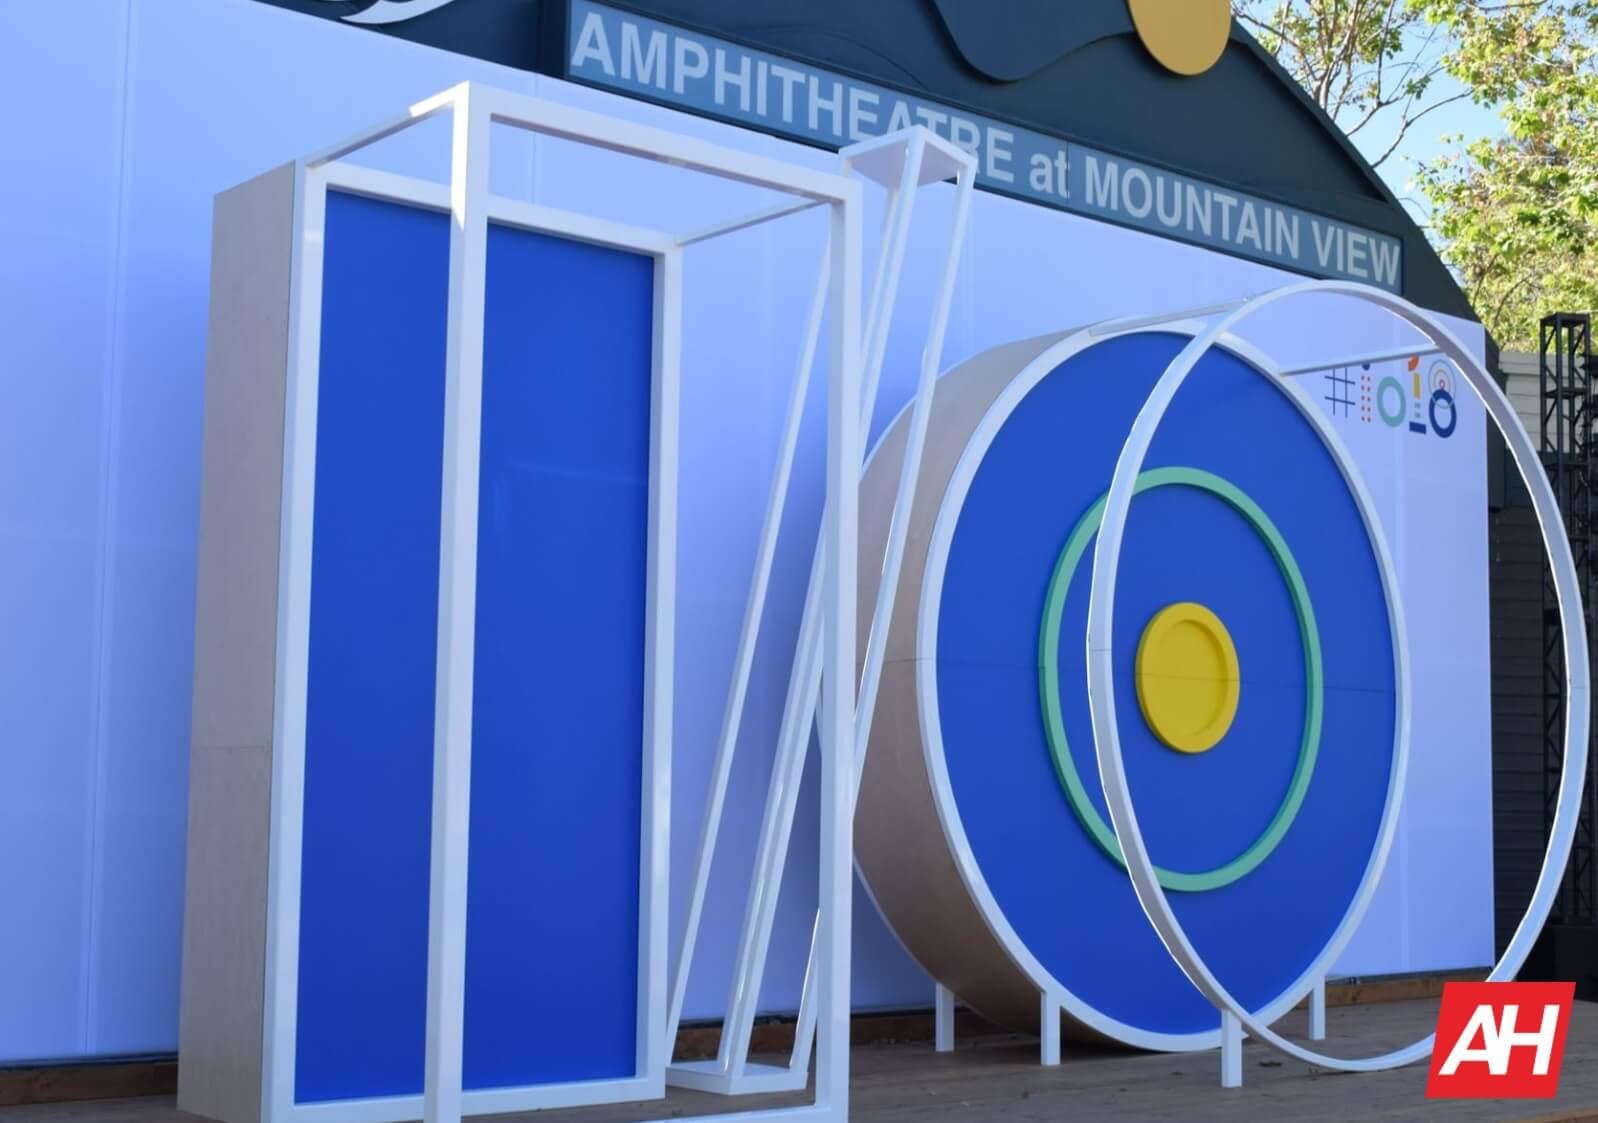 Google I/O 2019 Ticket Winners Now Being Notified